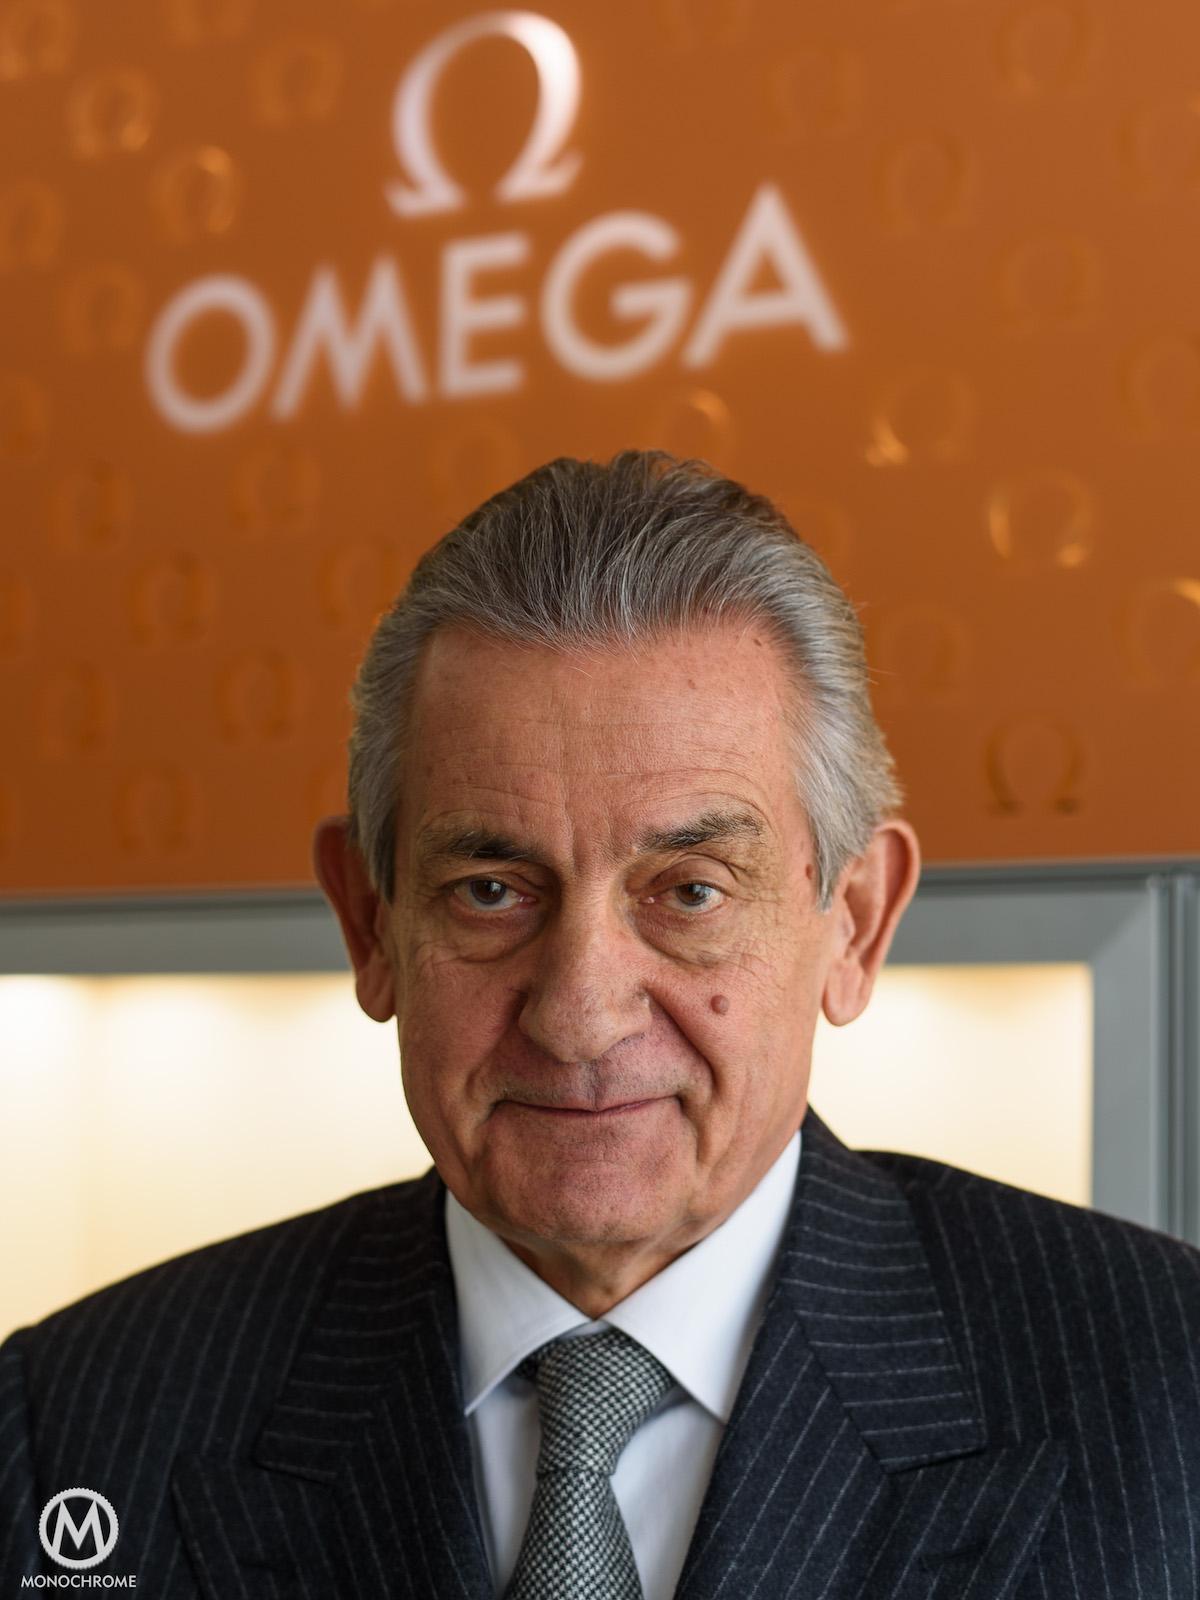 Omega - METAS - Headquarters visit - Stephen Urquhart